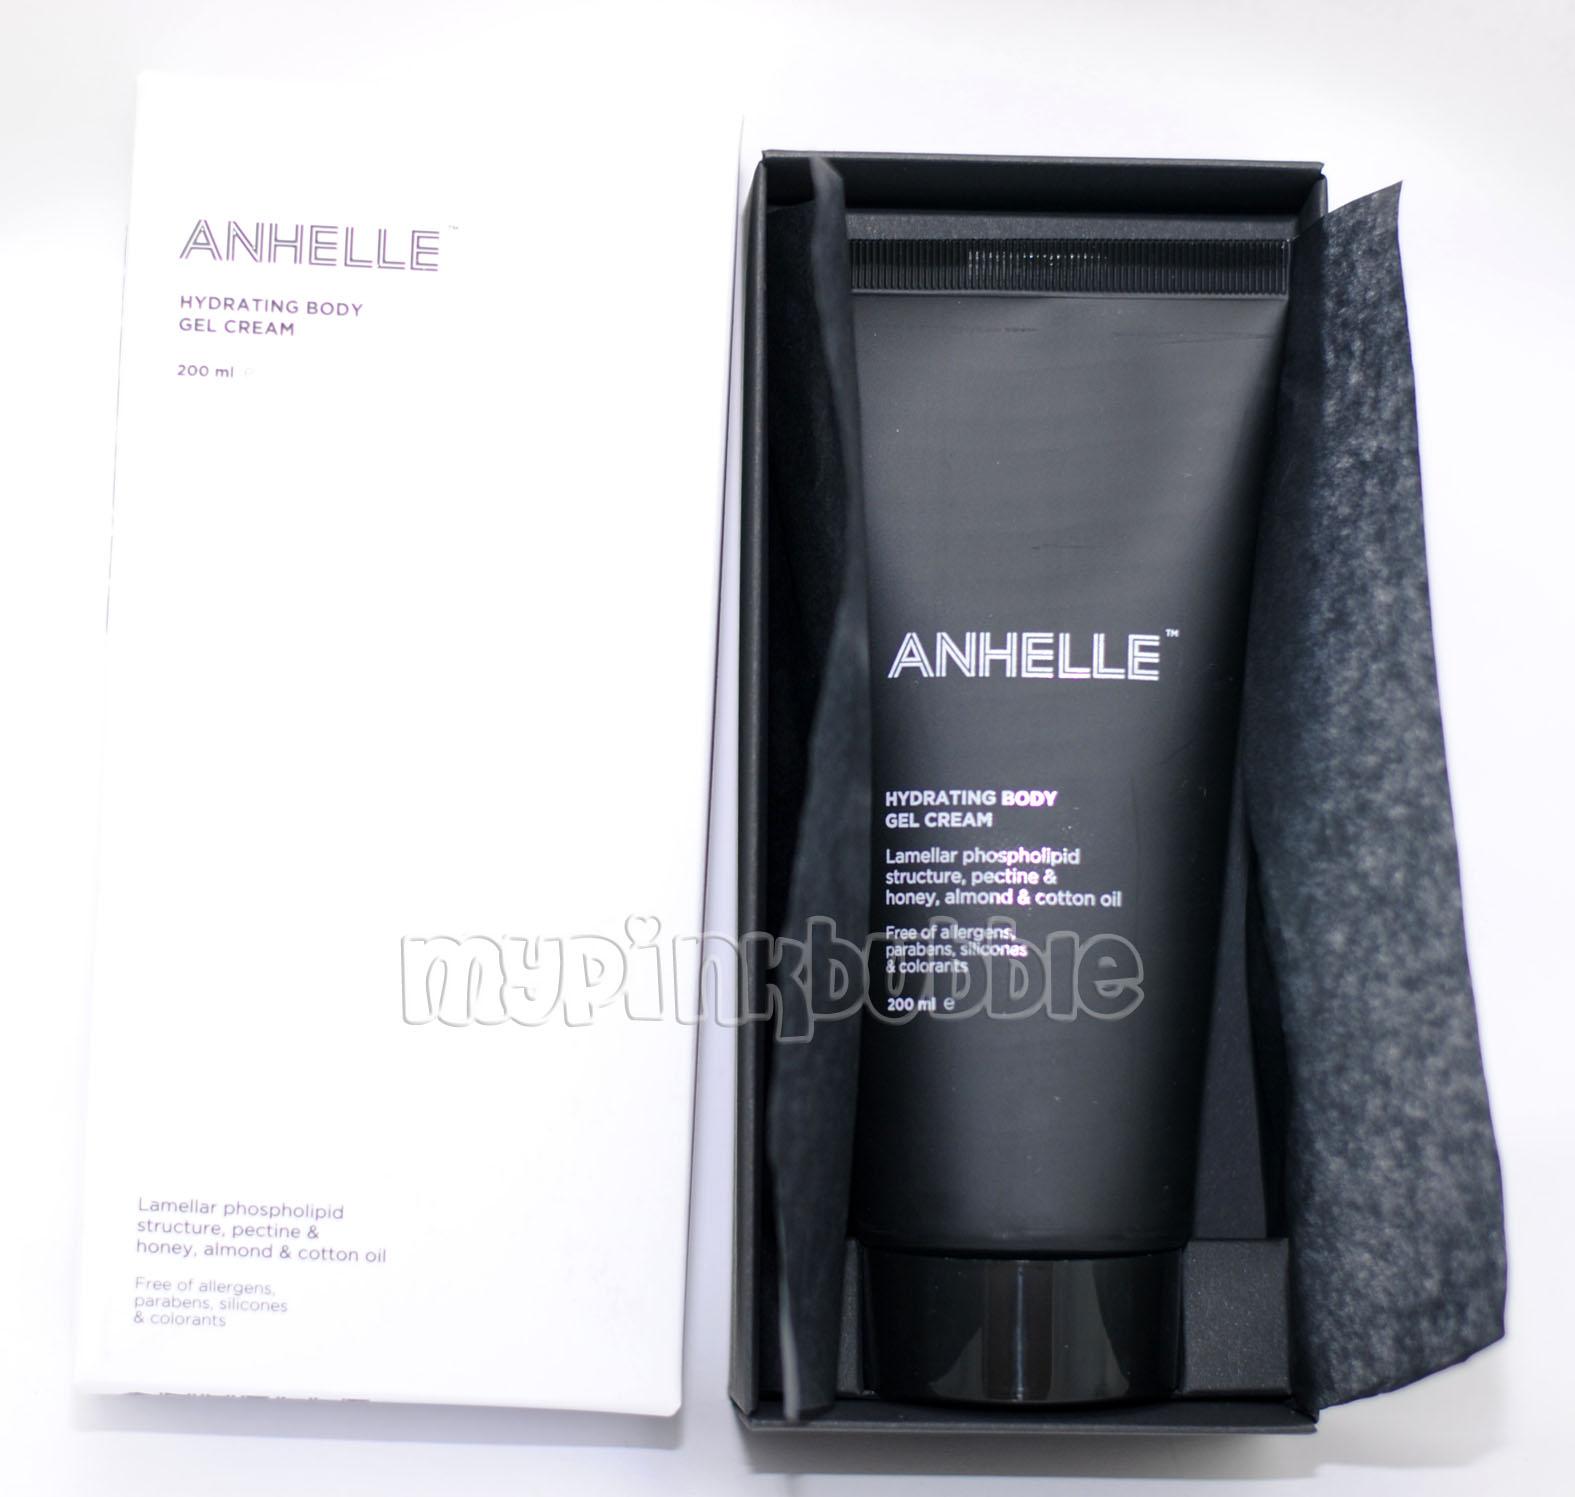 anhelle Hydrating body gel cream